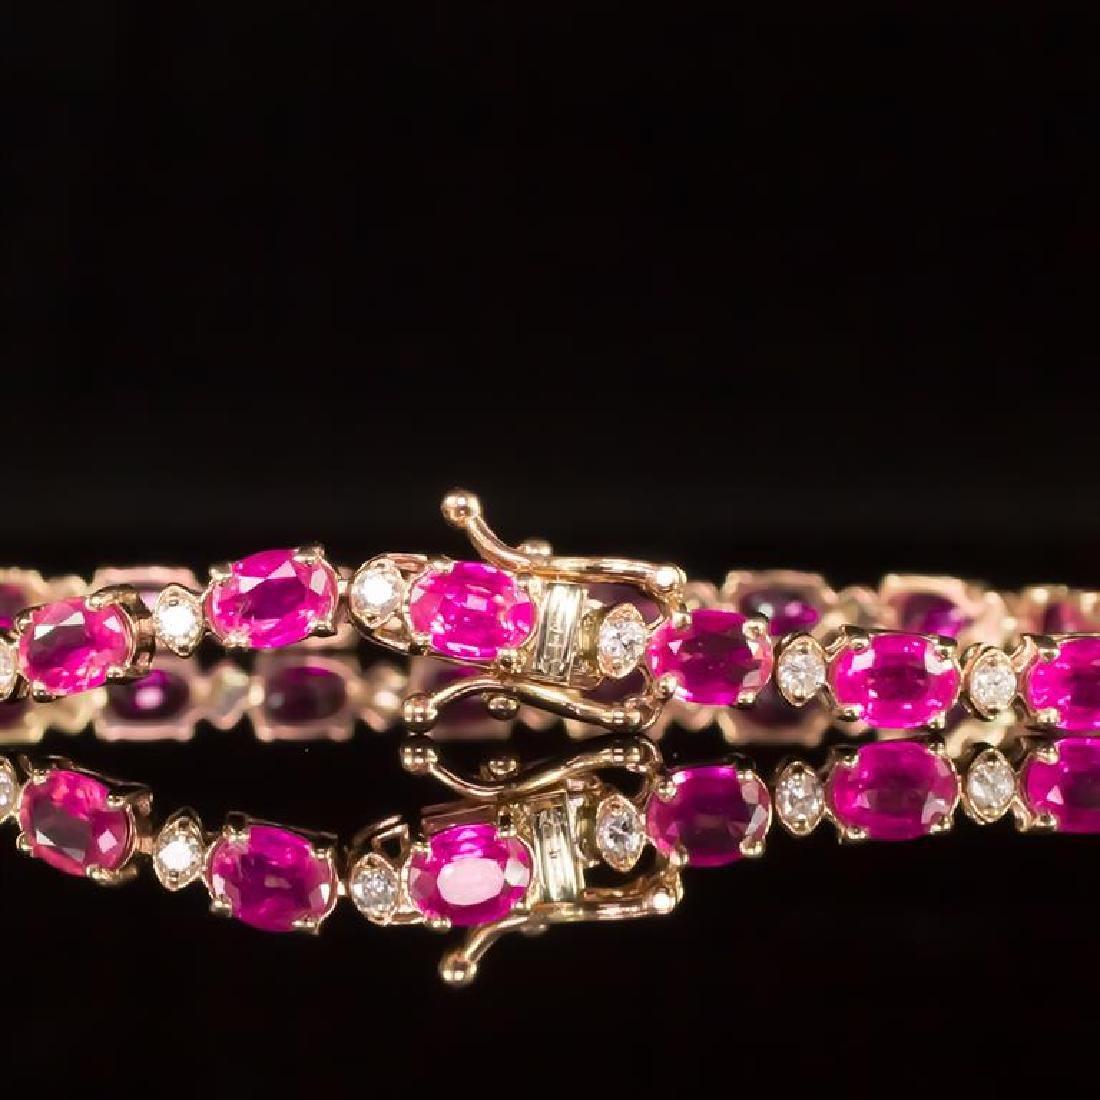 14K Gold 9.36ct Pink Sapphire 0.70ct Diamond Bracelet - 3